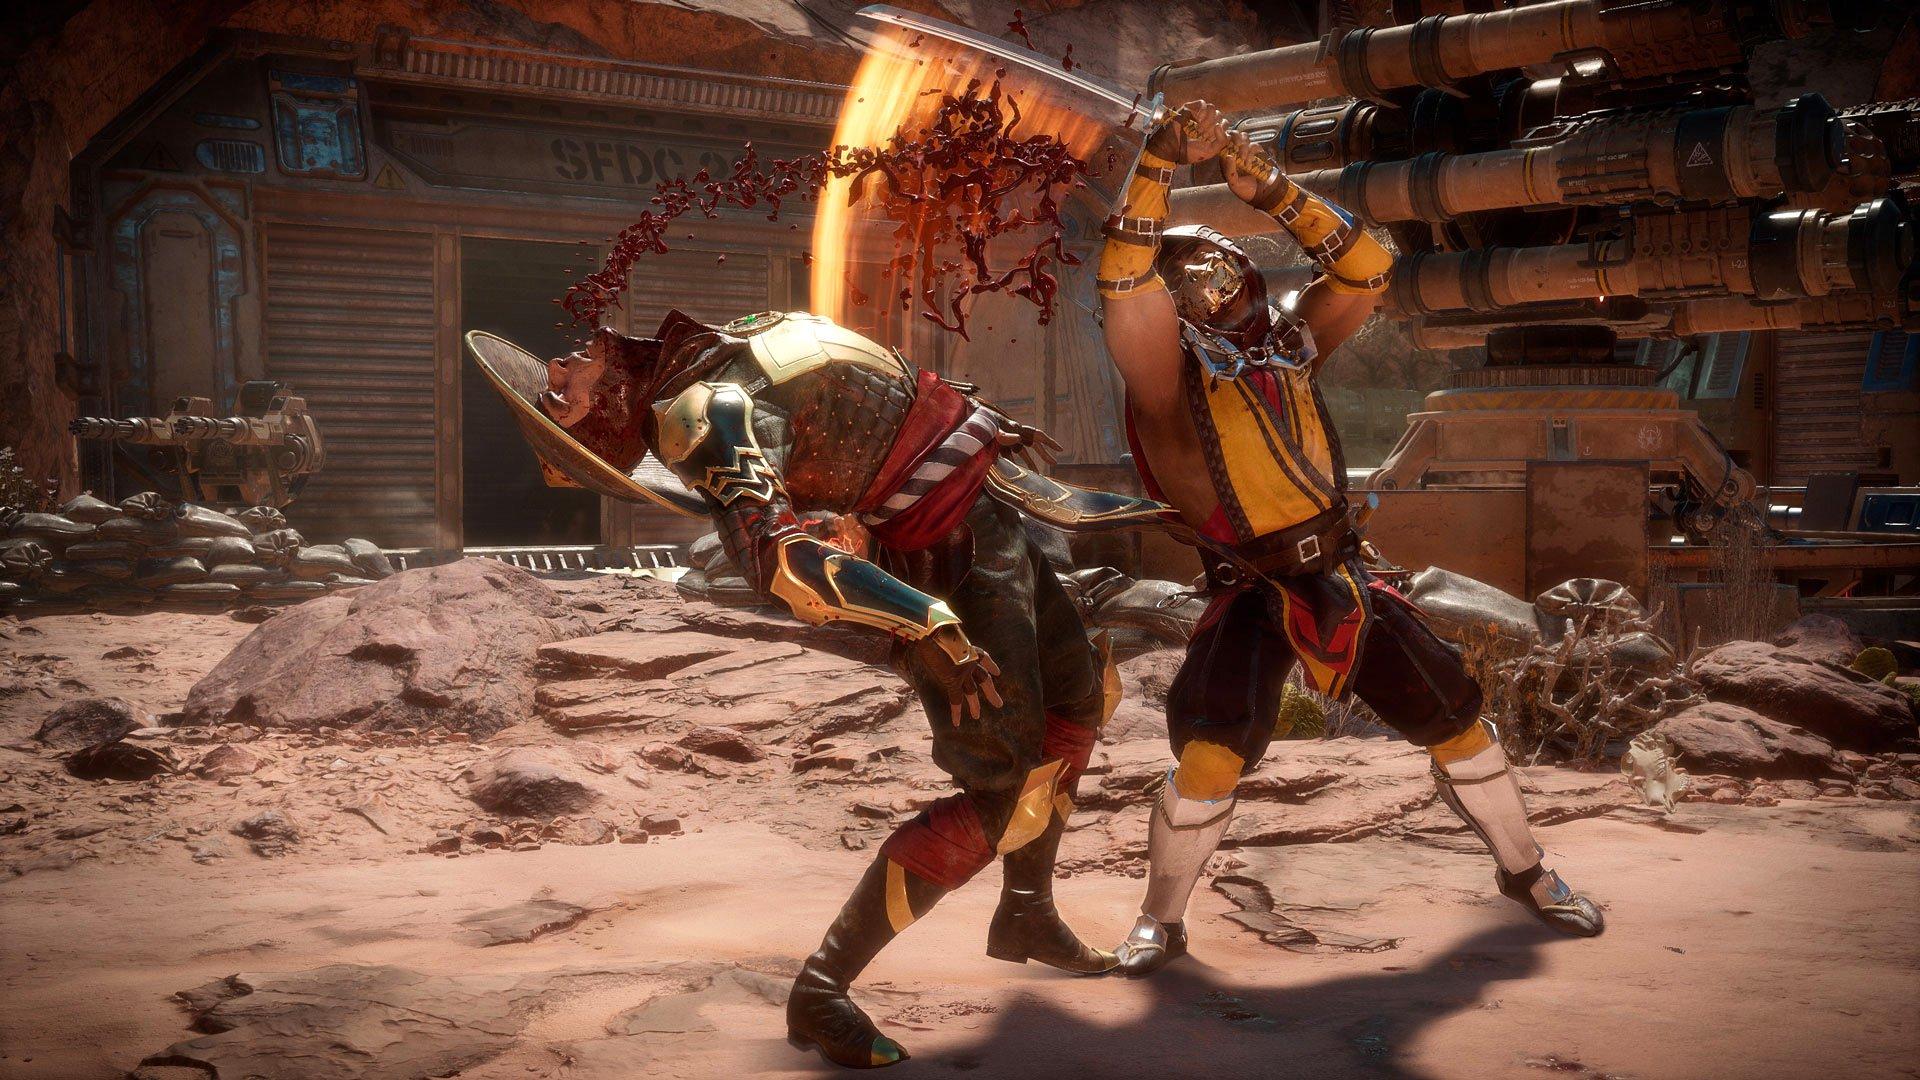 Mortal Kombat 11 (Picture: Warner Bros. Interactive Entertainment)